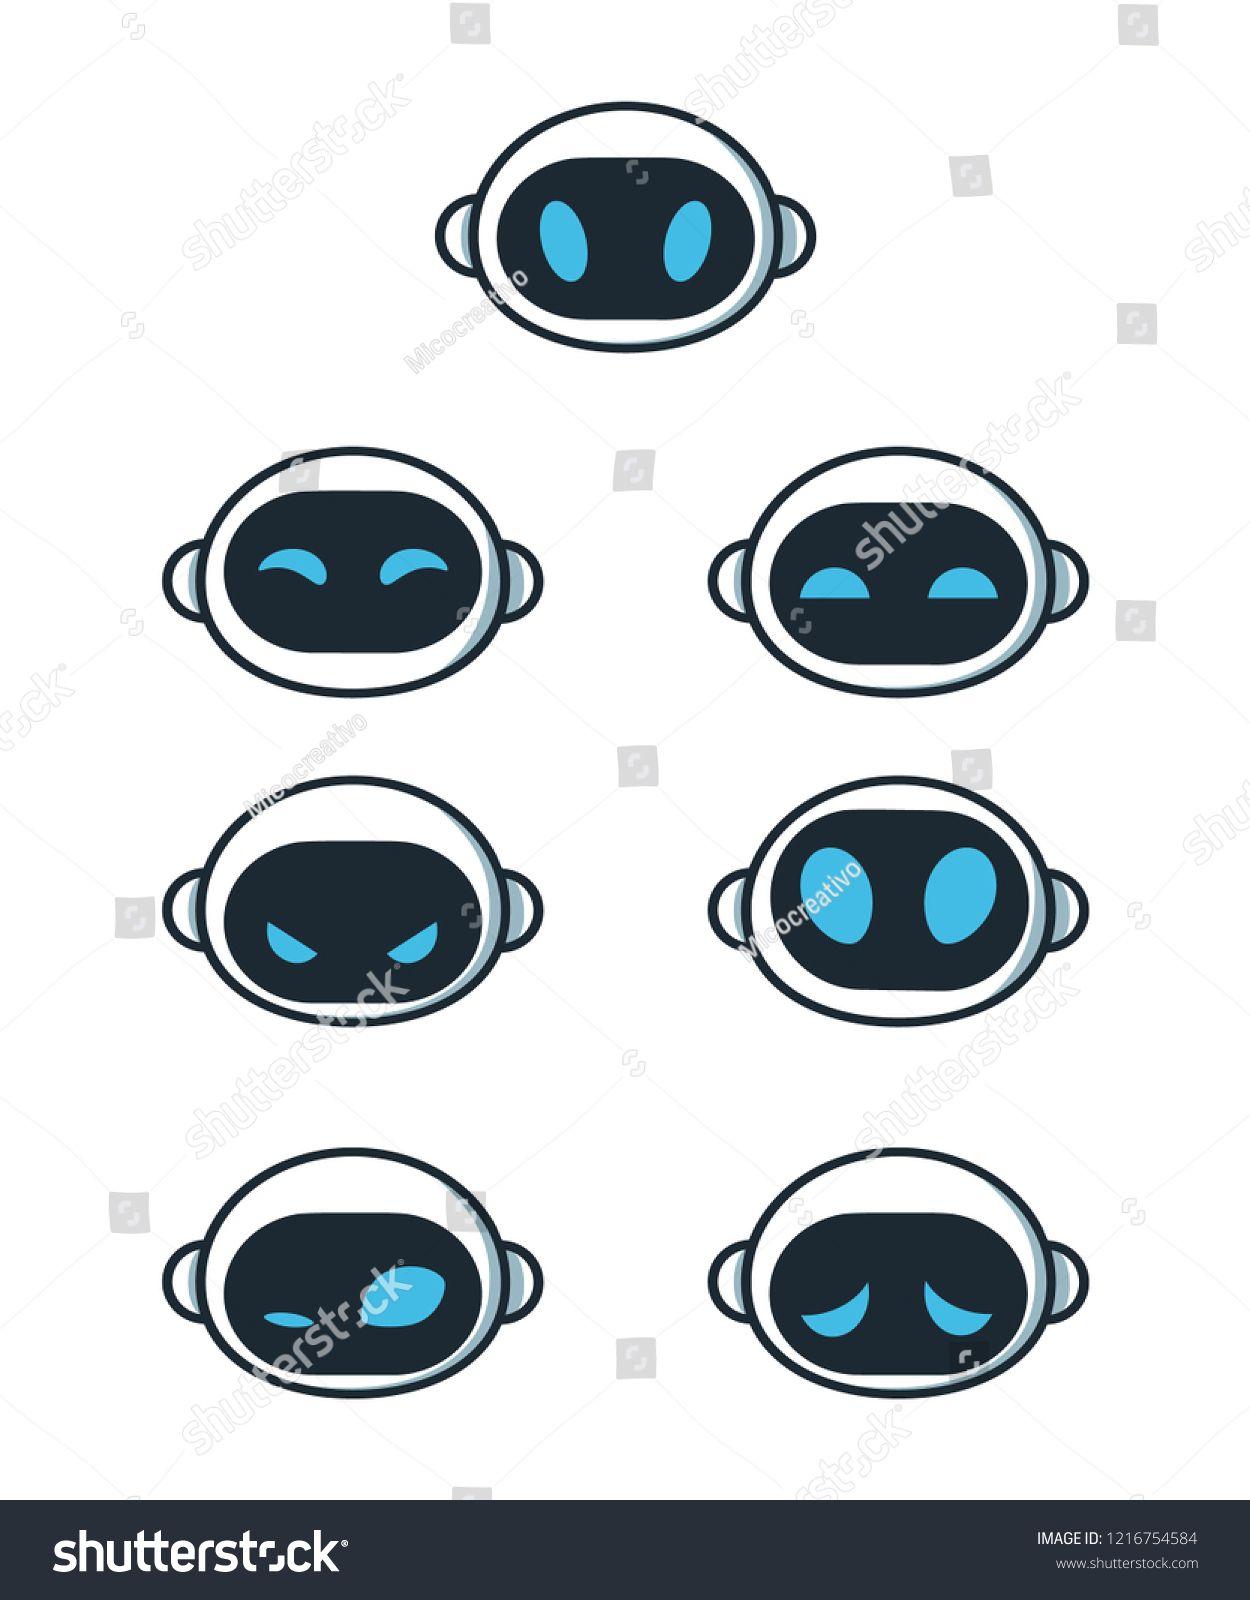 Cute Robot Bot Face Emotion Character Set Vector Modern Flat Style Cartoon Character Illustration Isolated Robot Design Sketch Robot Concept Art Robot Images